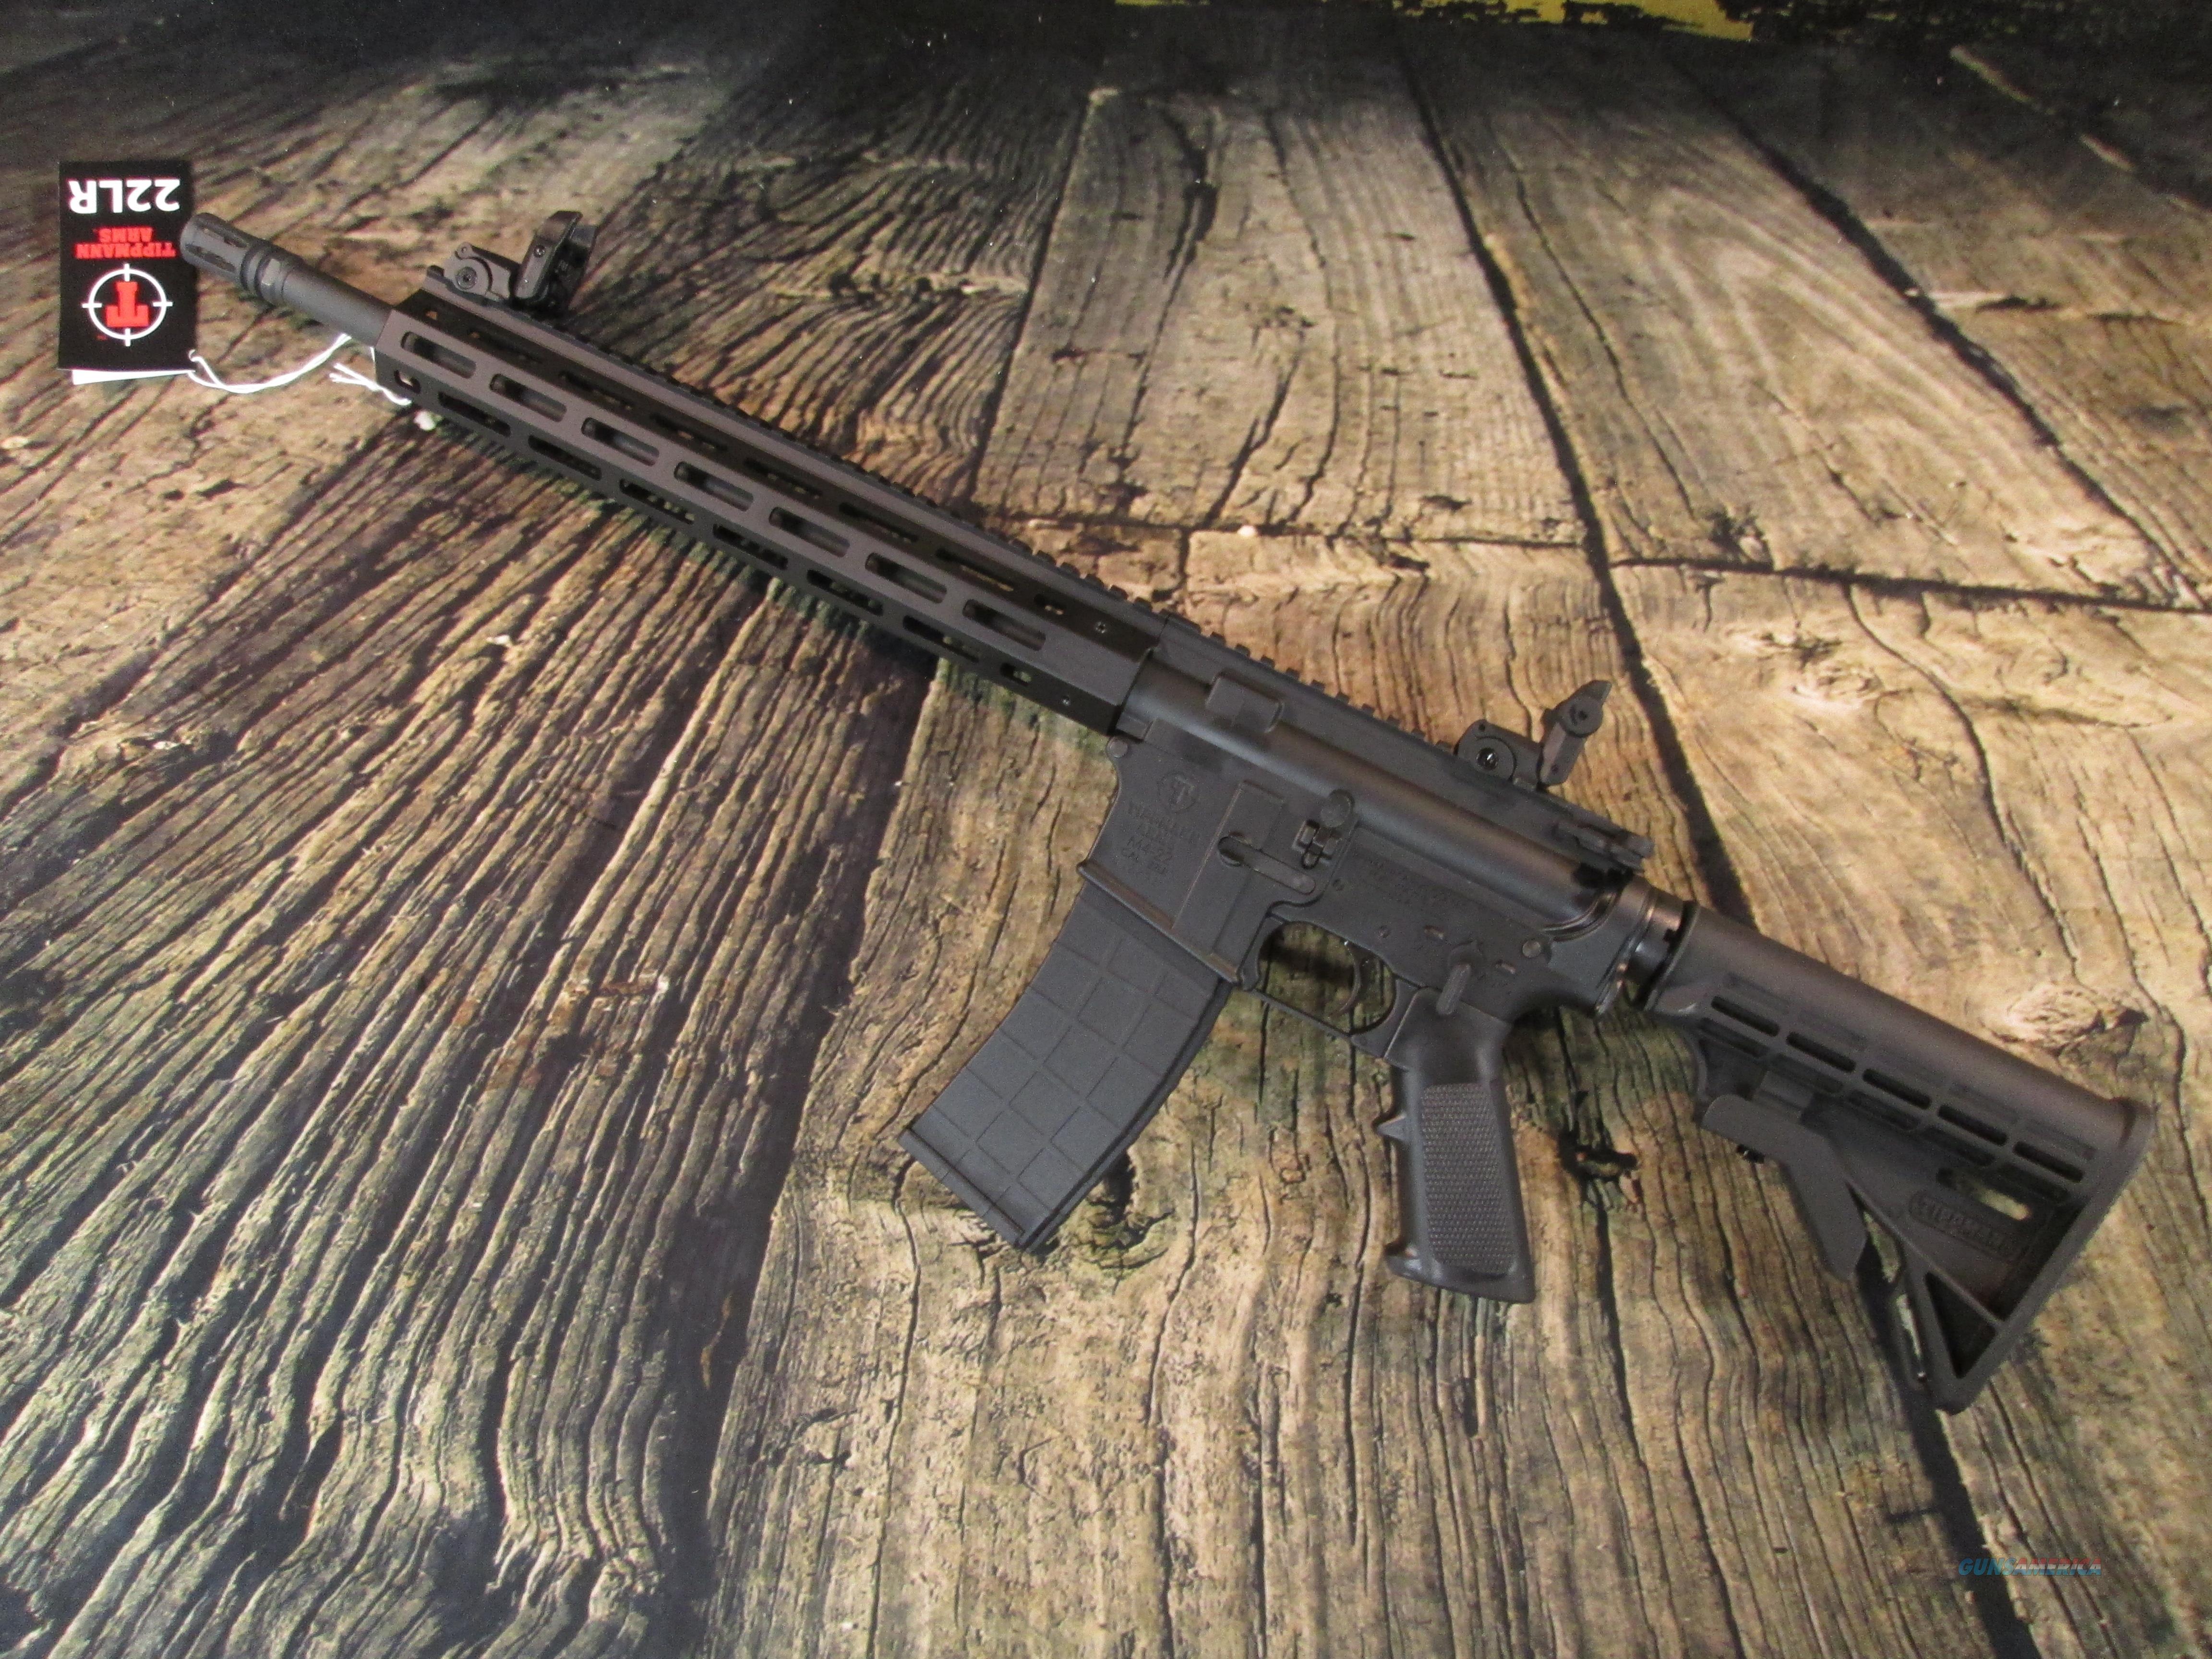 Tippmann Arms M4 22 Elite L Semi Auto Lr New A101032 Sku Model 98 Gun Diagram 13209846